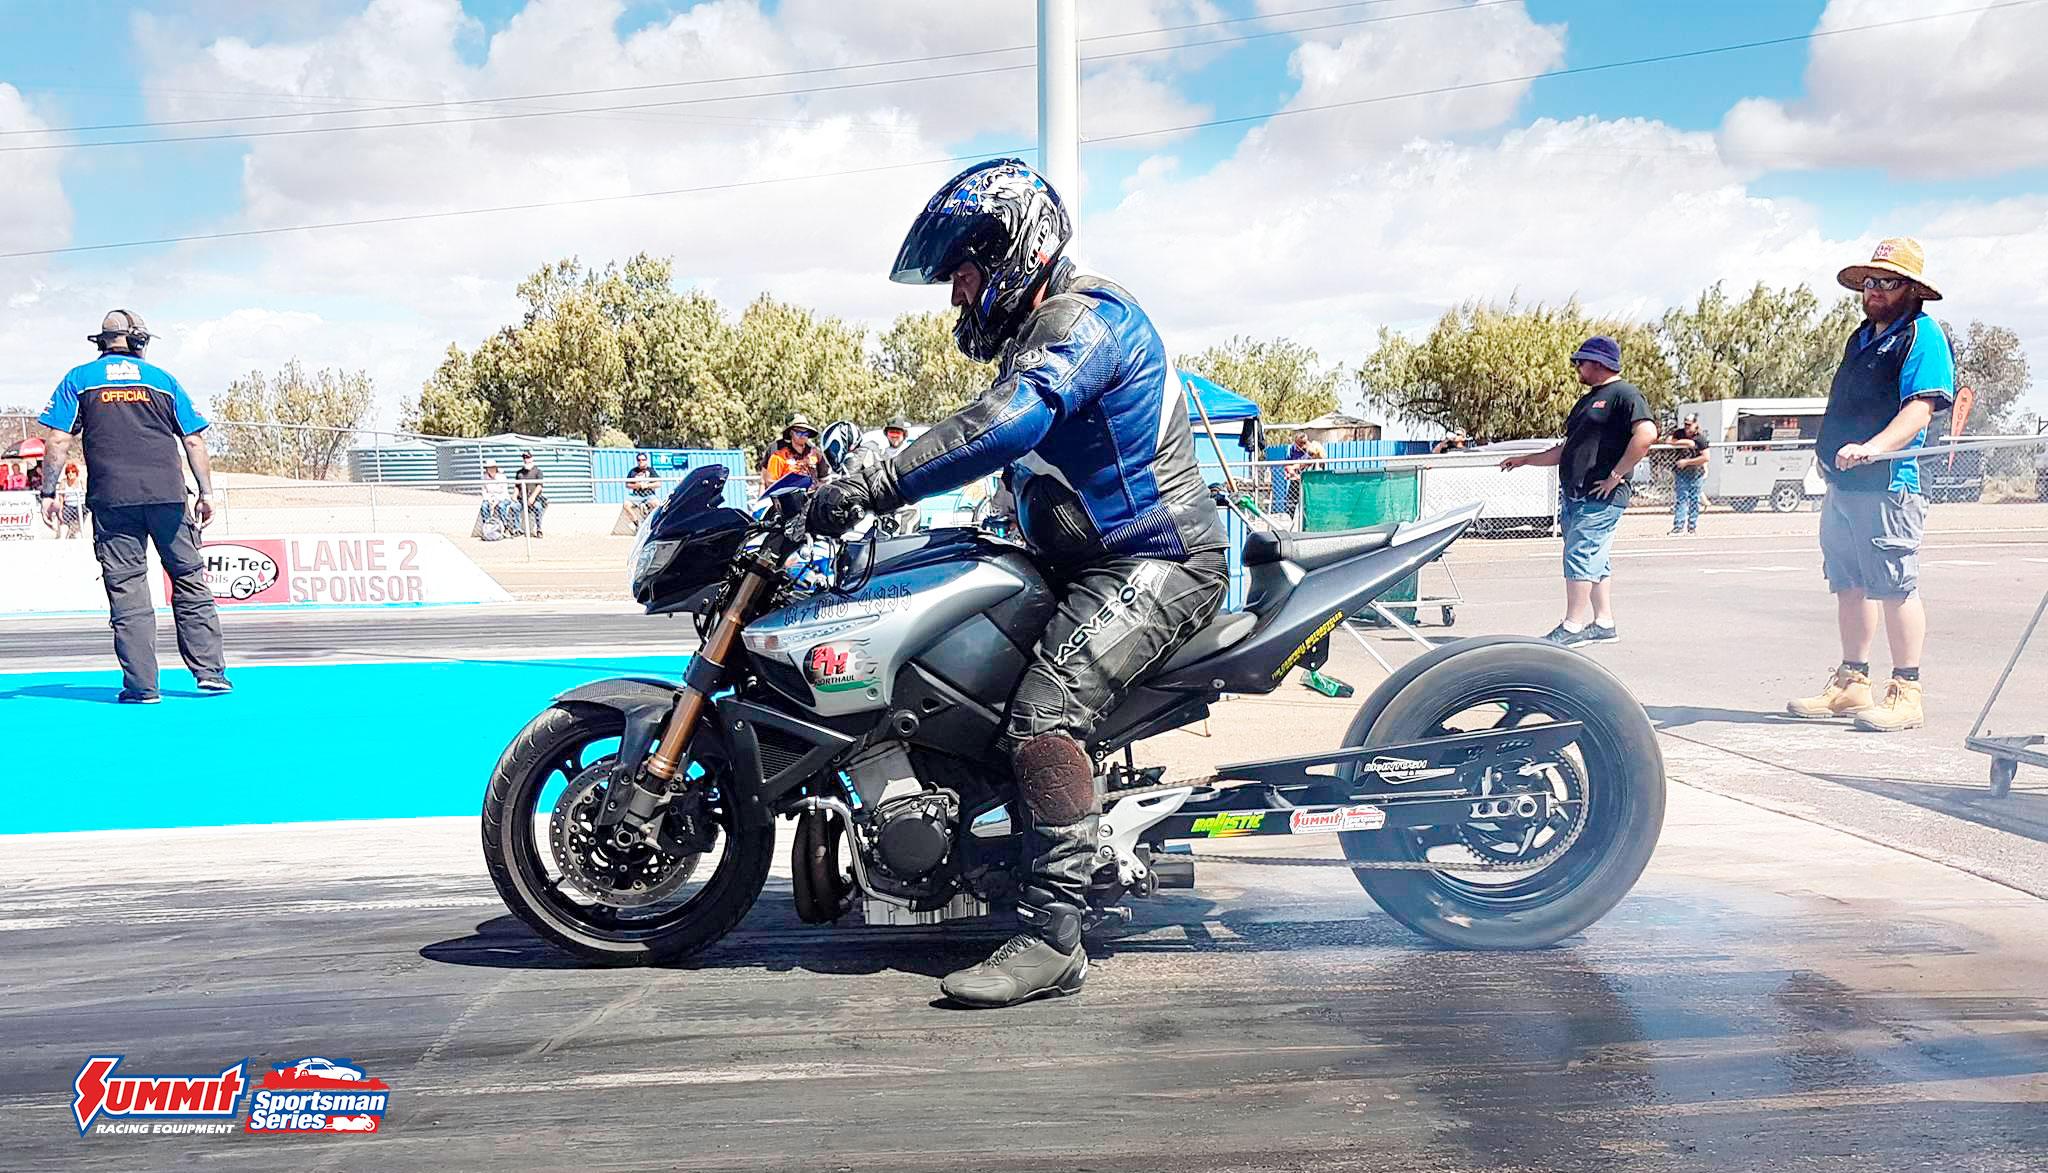 gavin-dohnt-mod-bike-tq